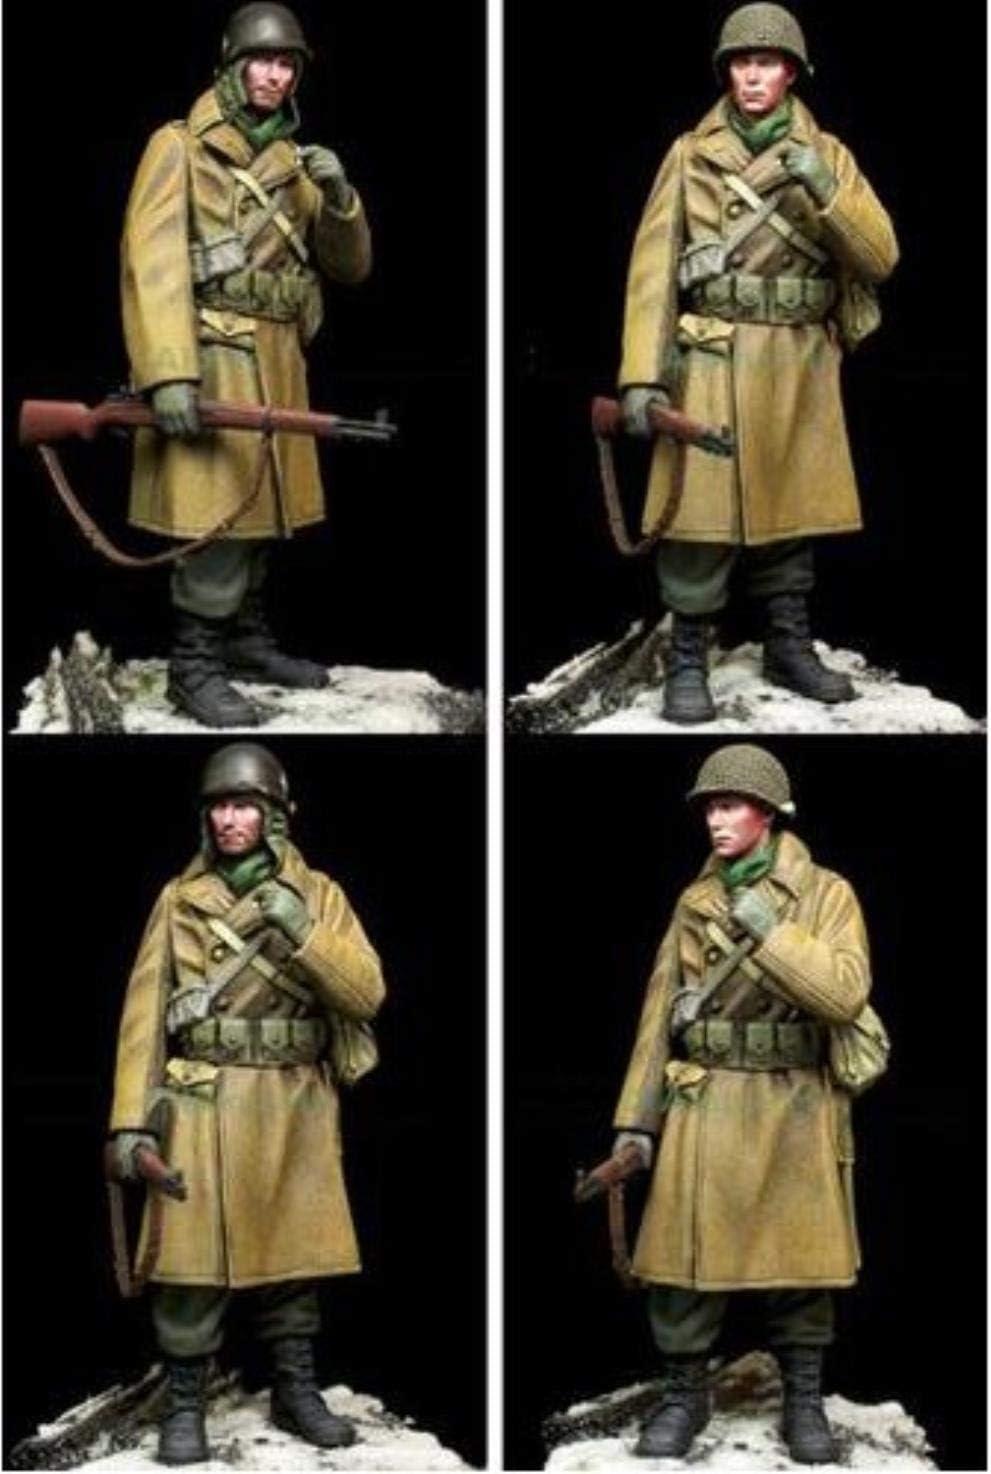 QINGLV Decoraci/ón Estatua Escultura 1//16 Escala Ww2 Soldados Estadounidenses En Invierno WWII Kit De Modelo De Resina Sin Pintar Figura En Miniatura